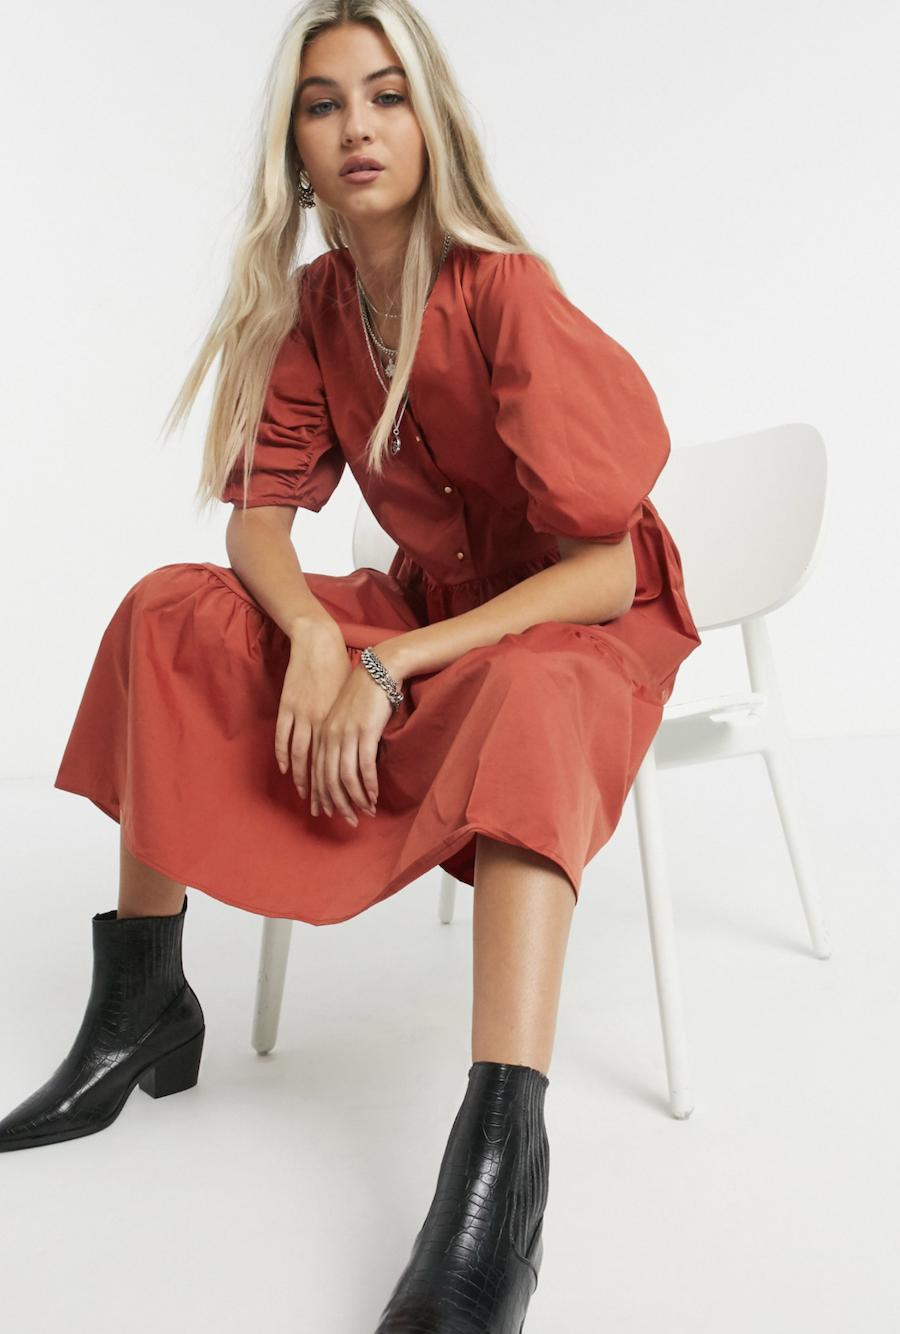 Vestido midi de corte amplio con mangas abullonadas en rojo Tamara de Object